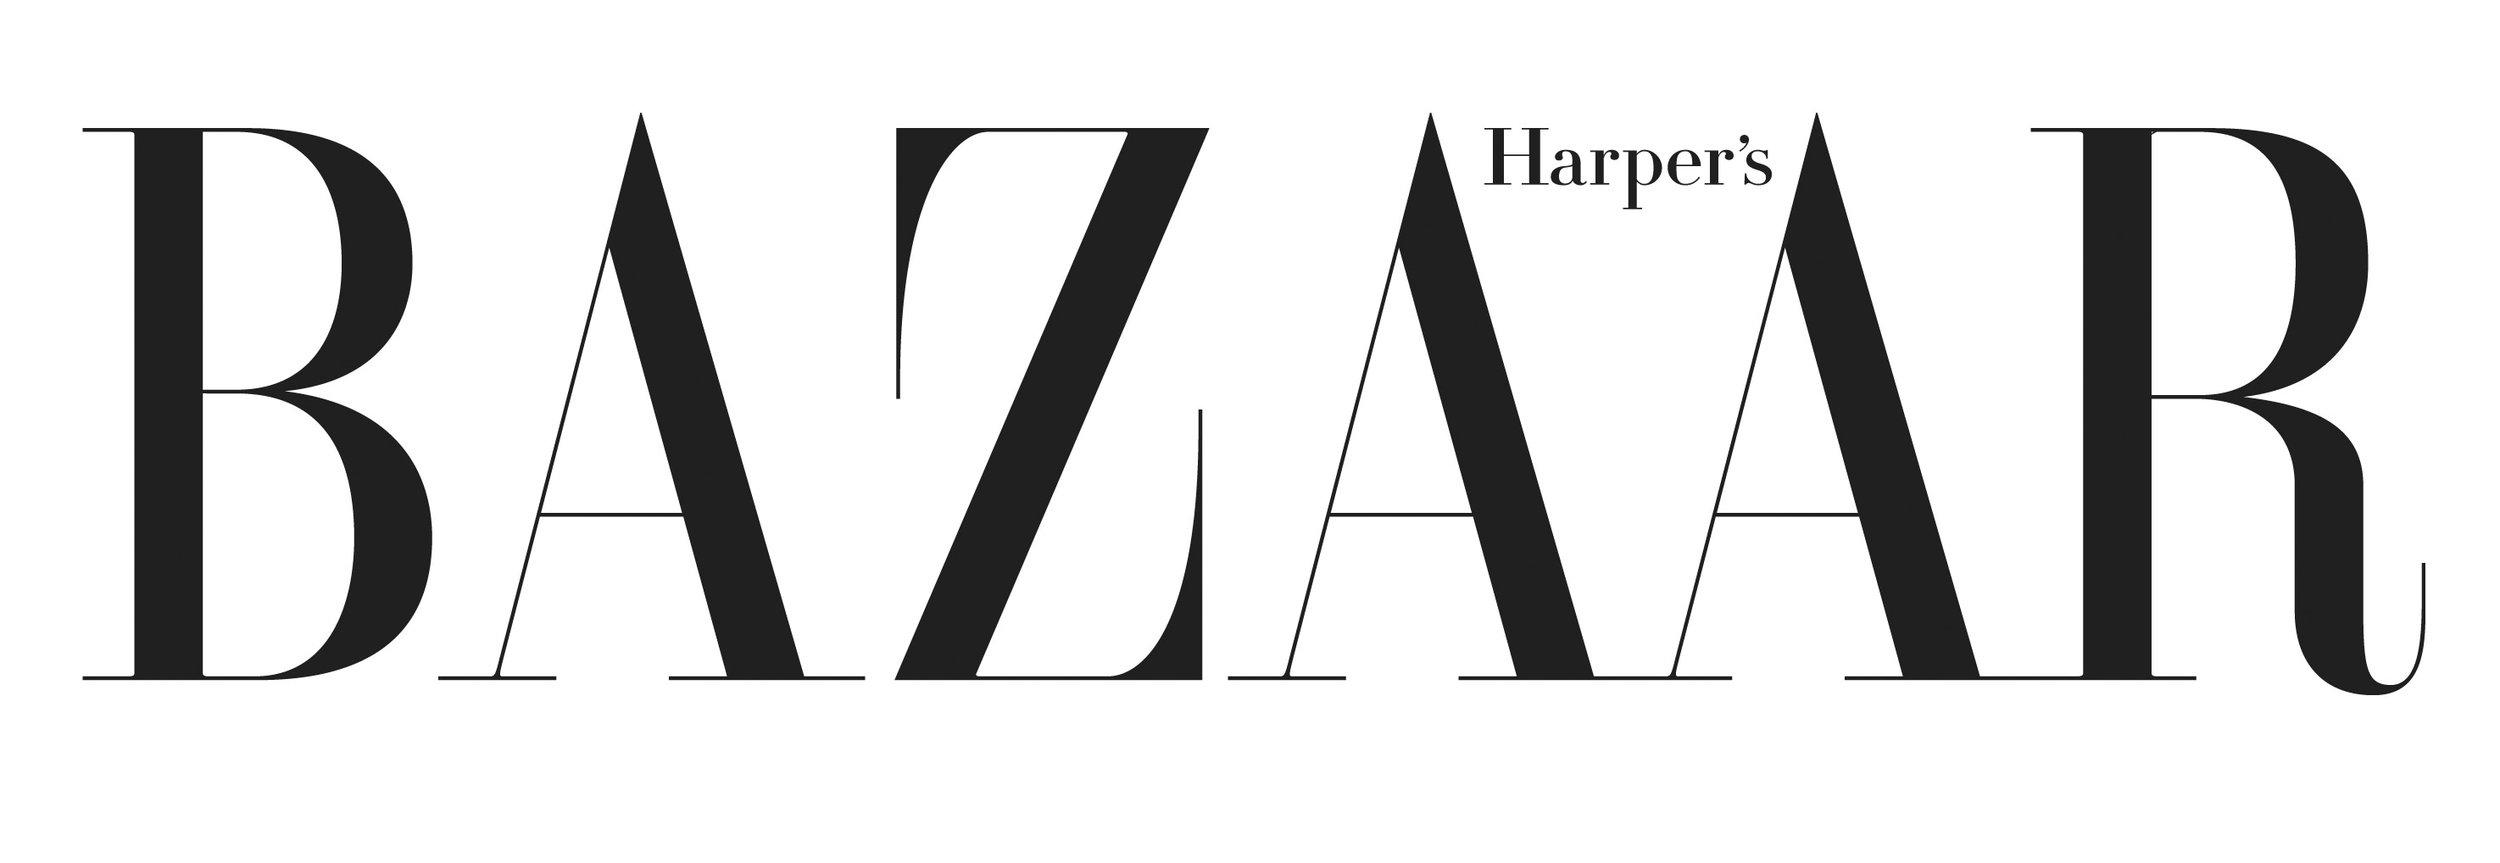 lane-and-lanae-Harper's-Bazaar.jpg